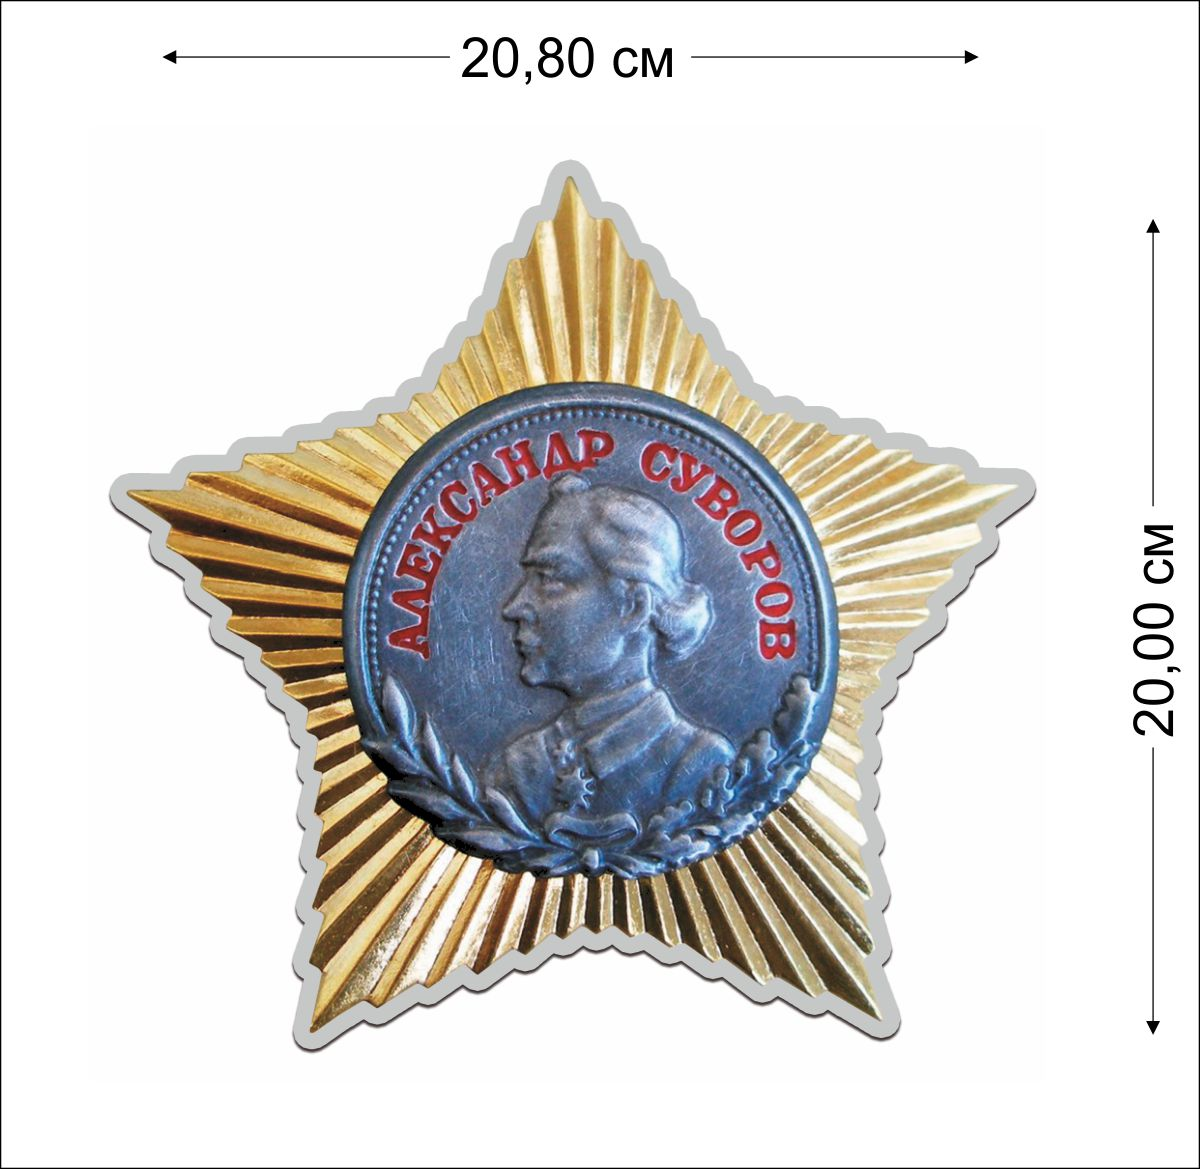 Наклейка с орденом Суворова 2 степени